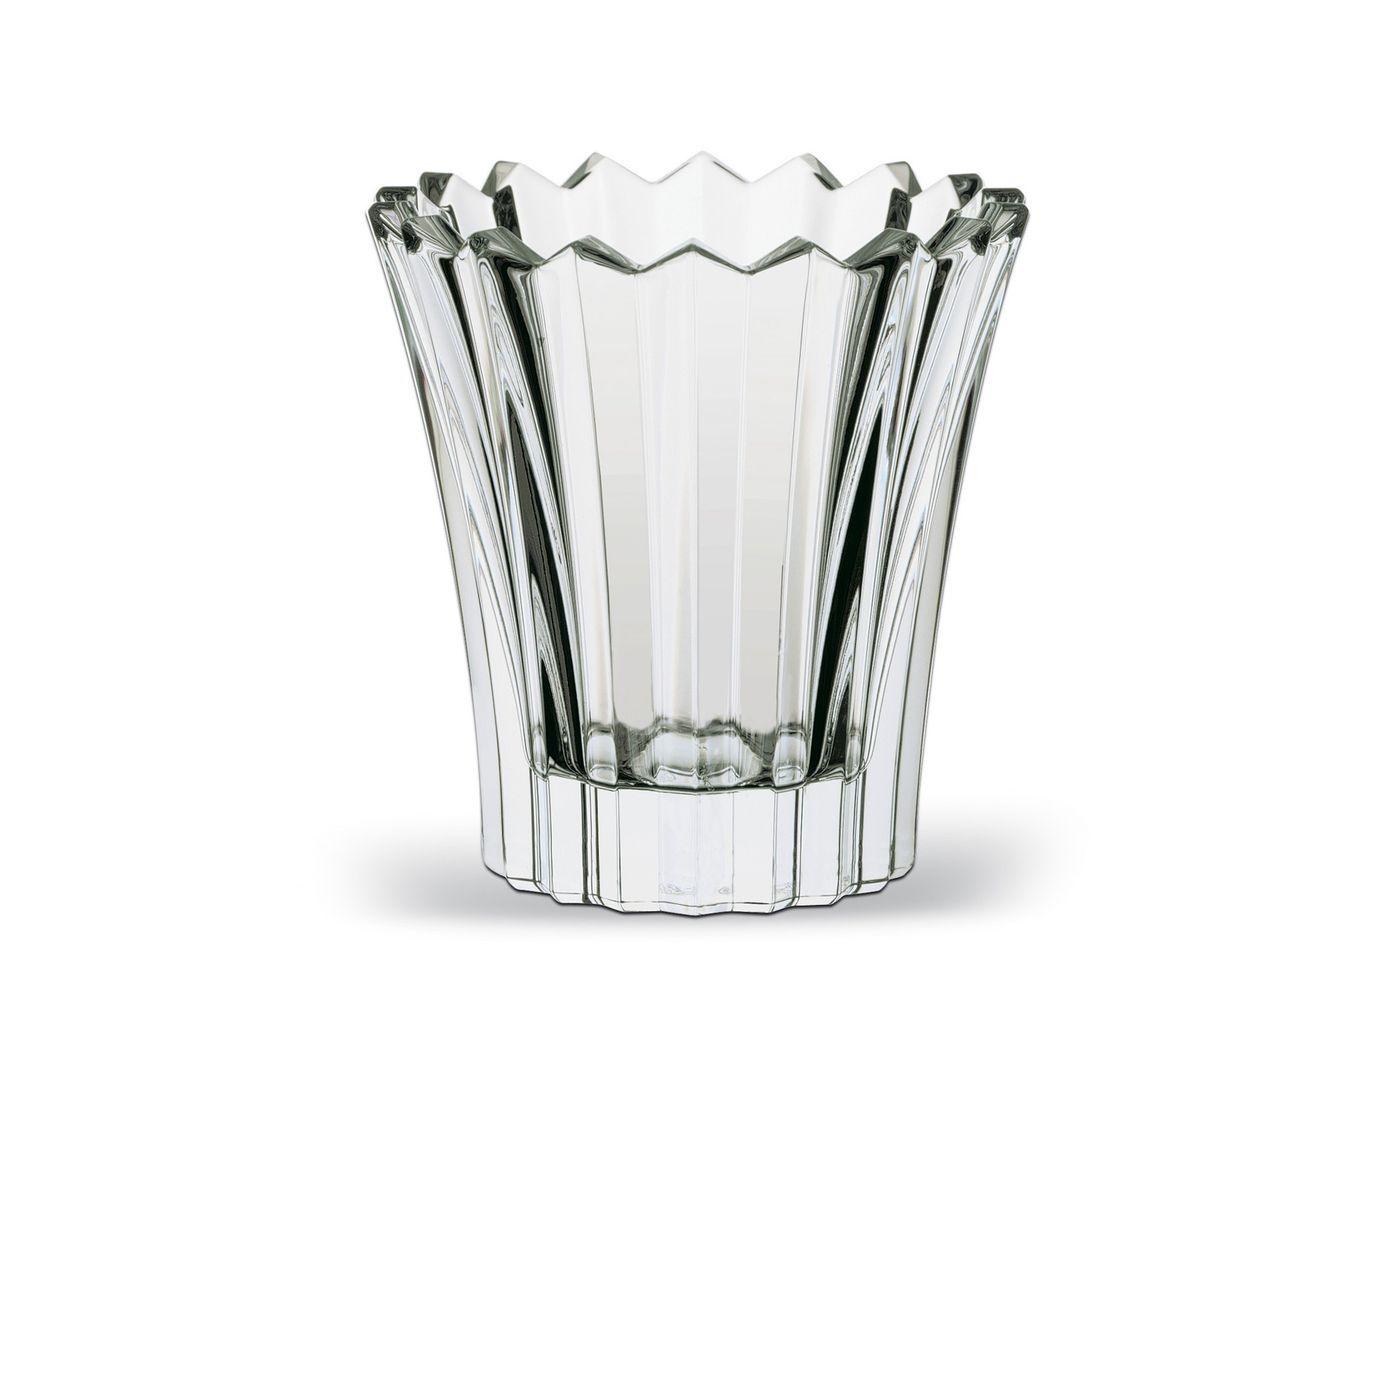 Vaso Bouquet Mille Nuits Baccarat Vasi E Coppe Ornamentali